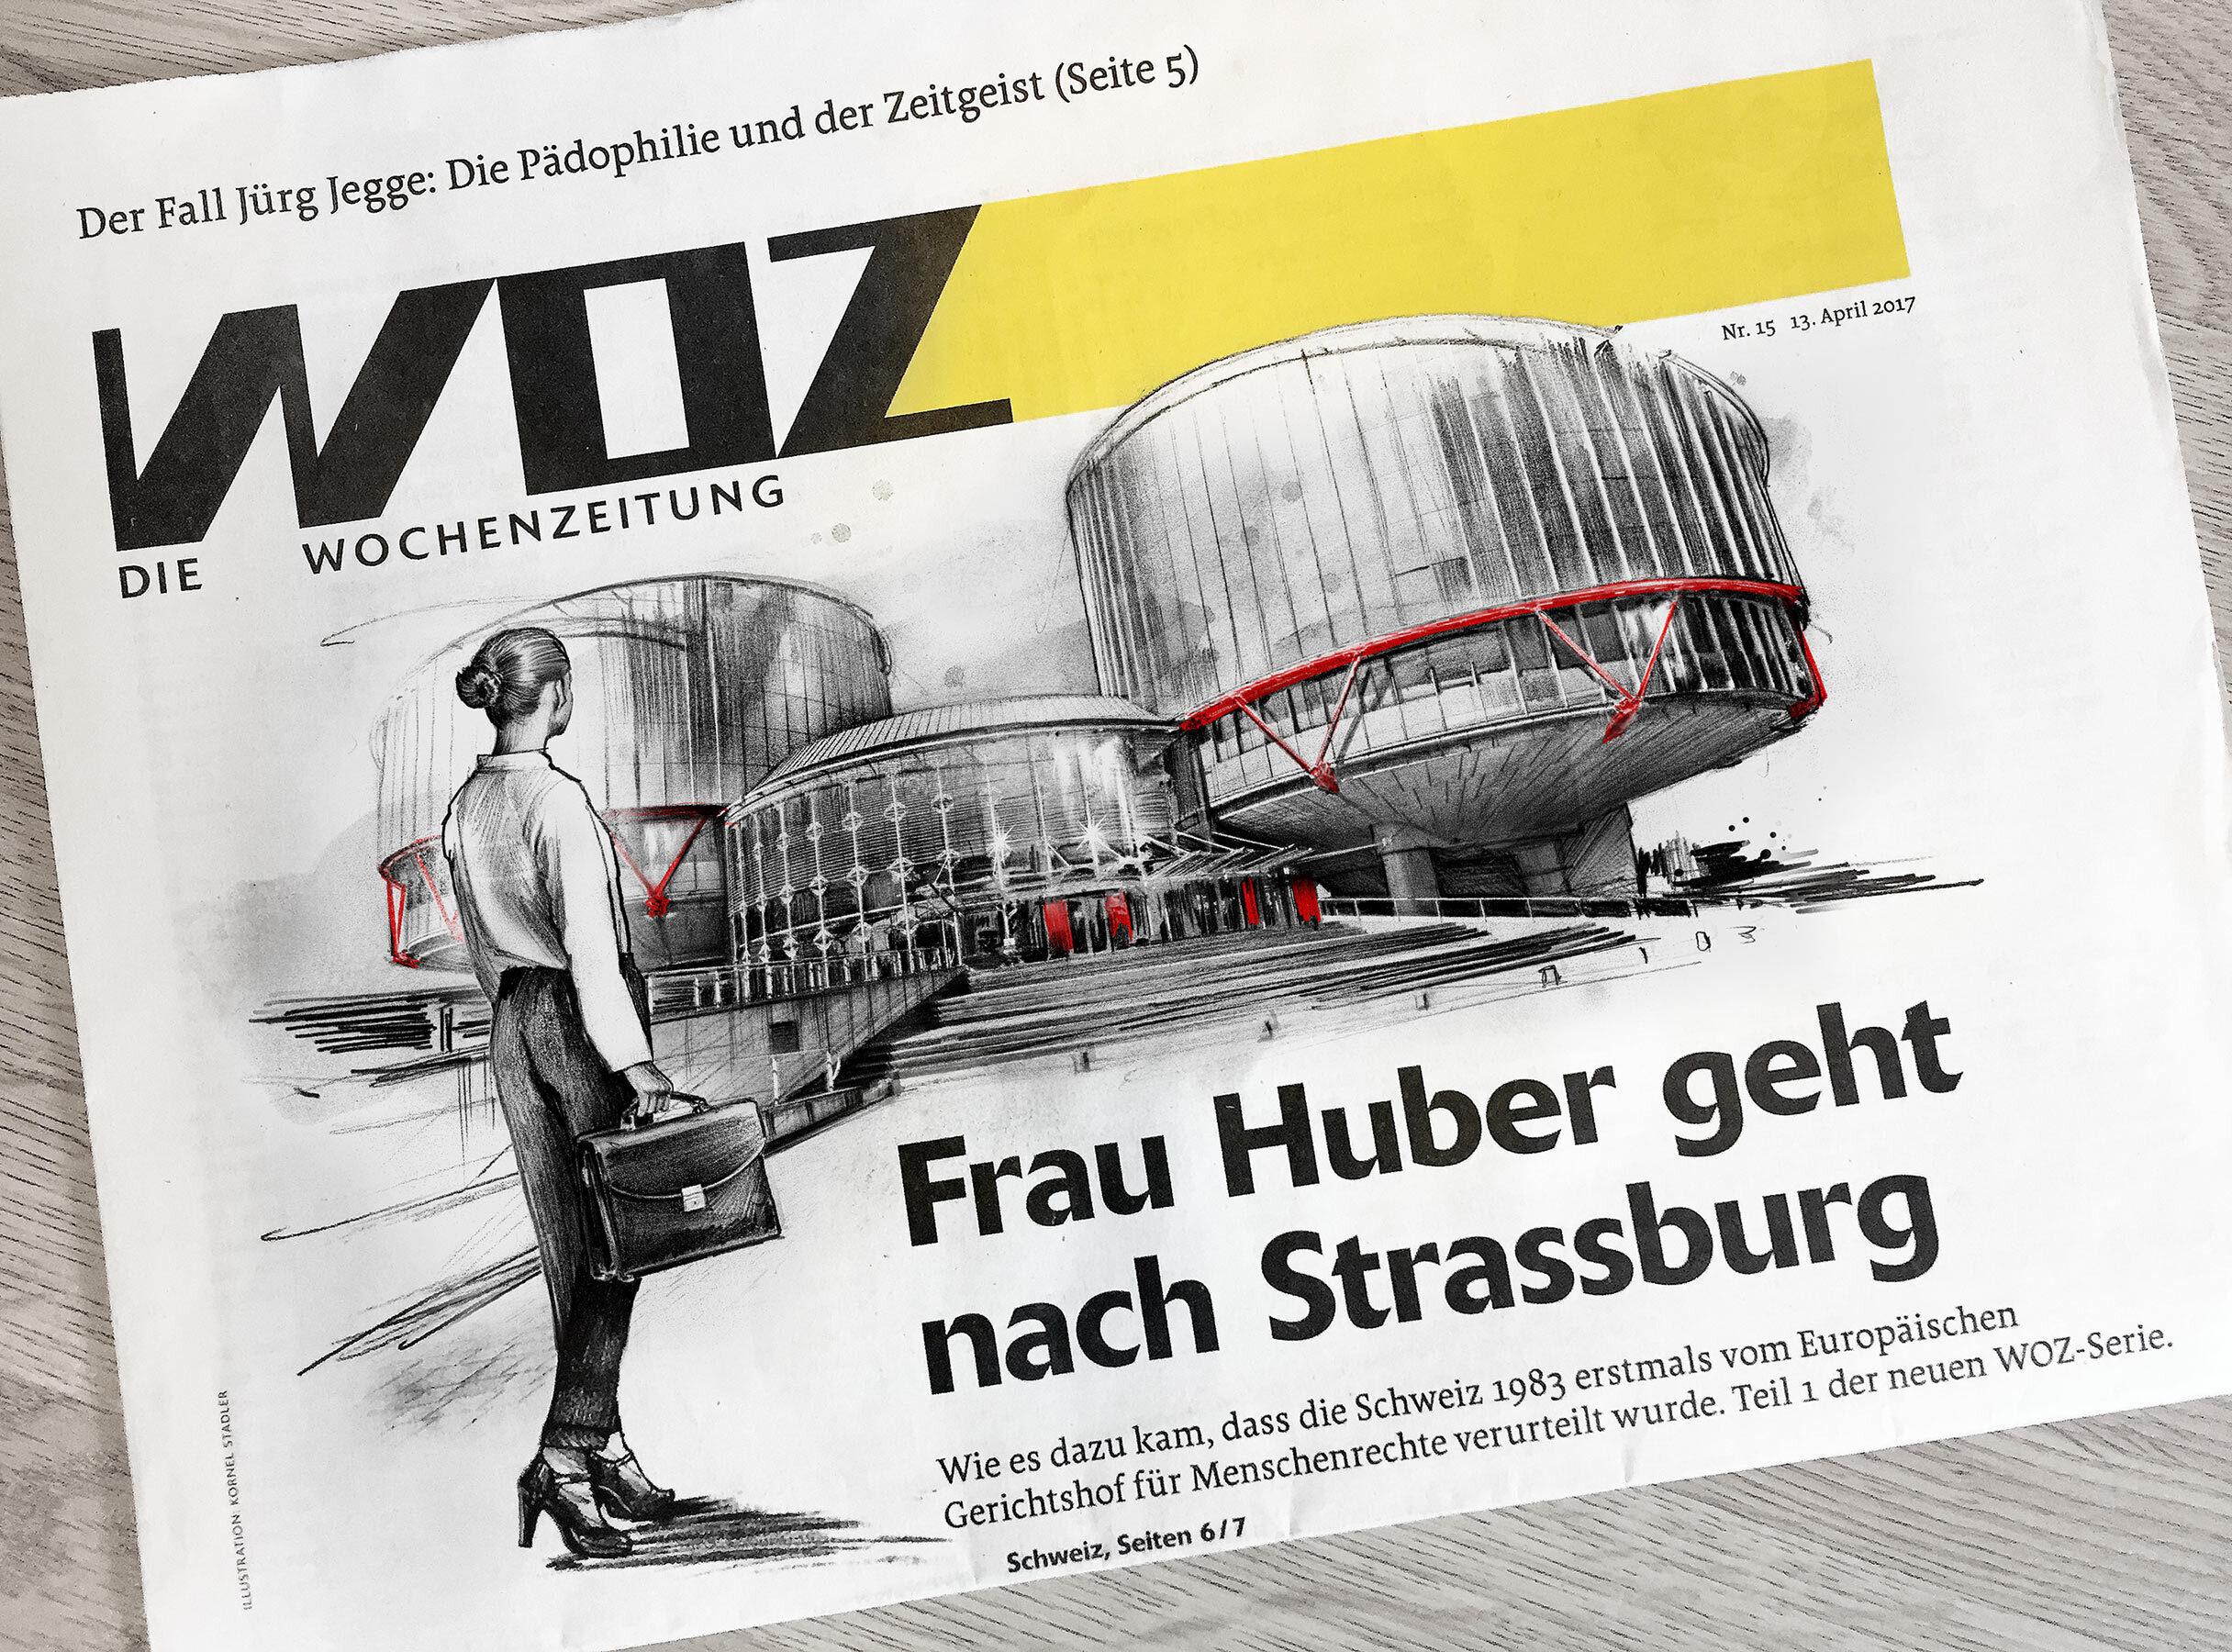 WOZ fron cover ollustration frau huber strassburg intenationaler gerichtshof menschenrechte - Kornel Illustration | Kornel Stadler portfolio